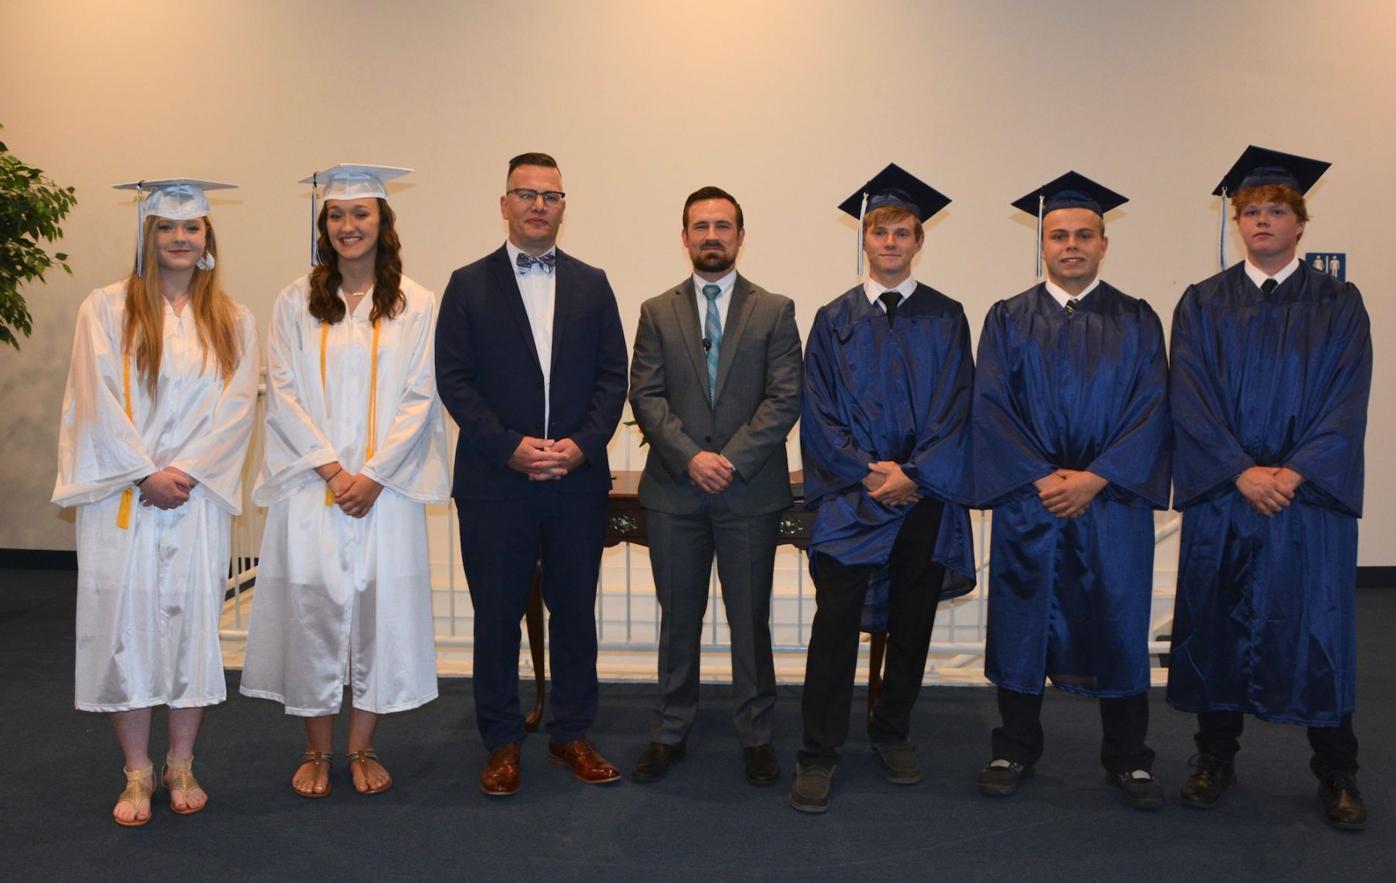 CCA graduates told to enjoy new journey